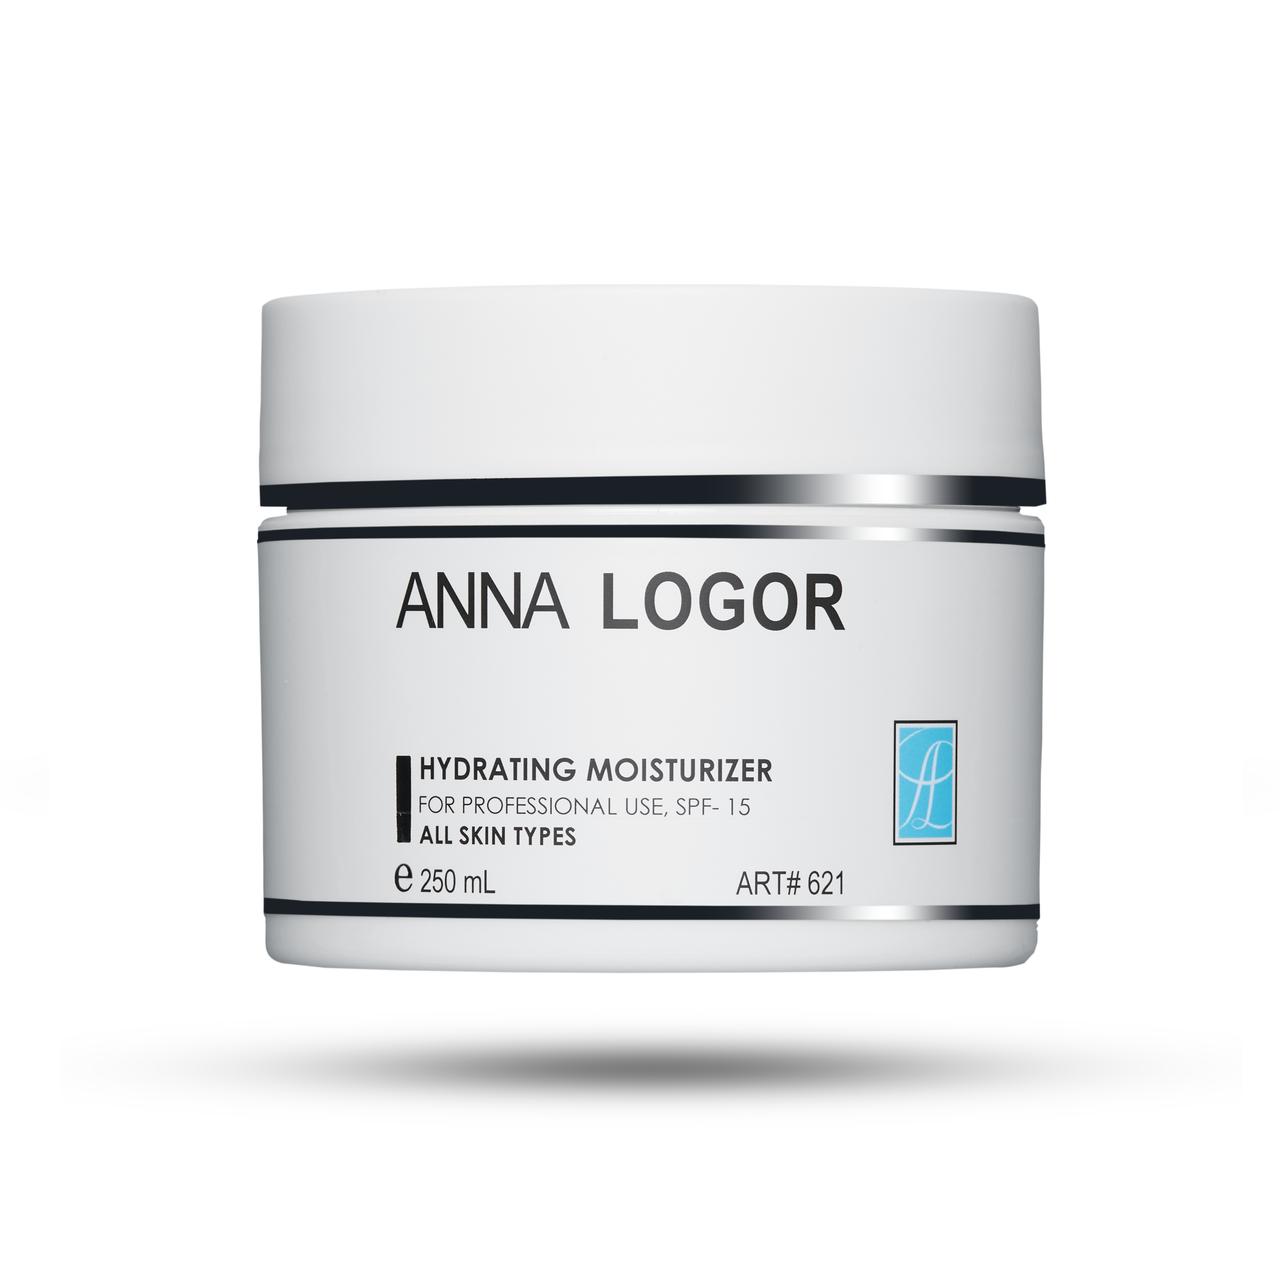 Крем увлажняющий для всех типов кожи Anna LOGOR Hydrating Moisturizer 250 мл Art.621